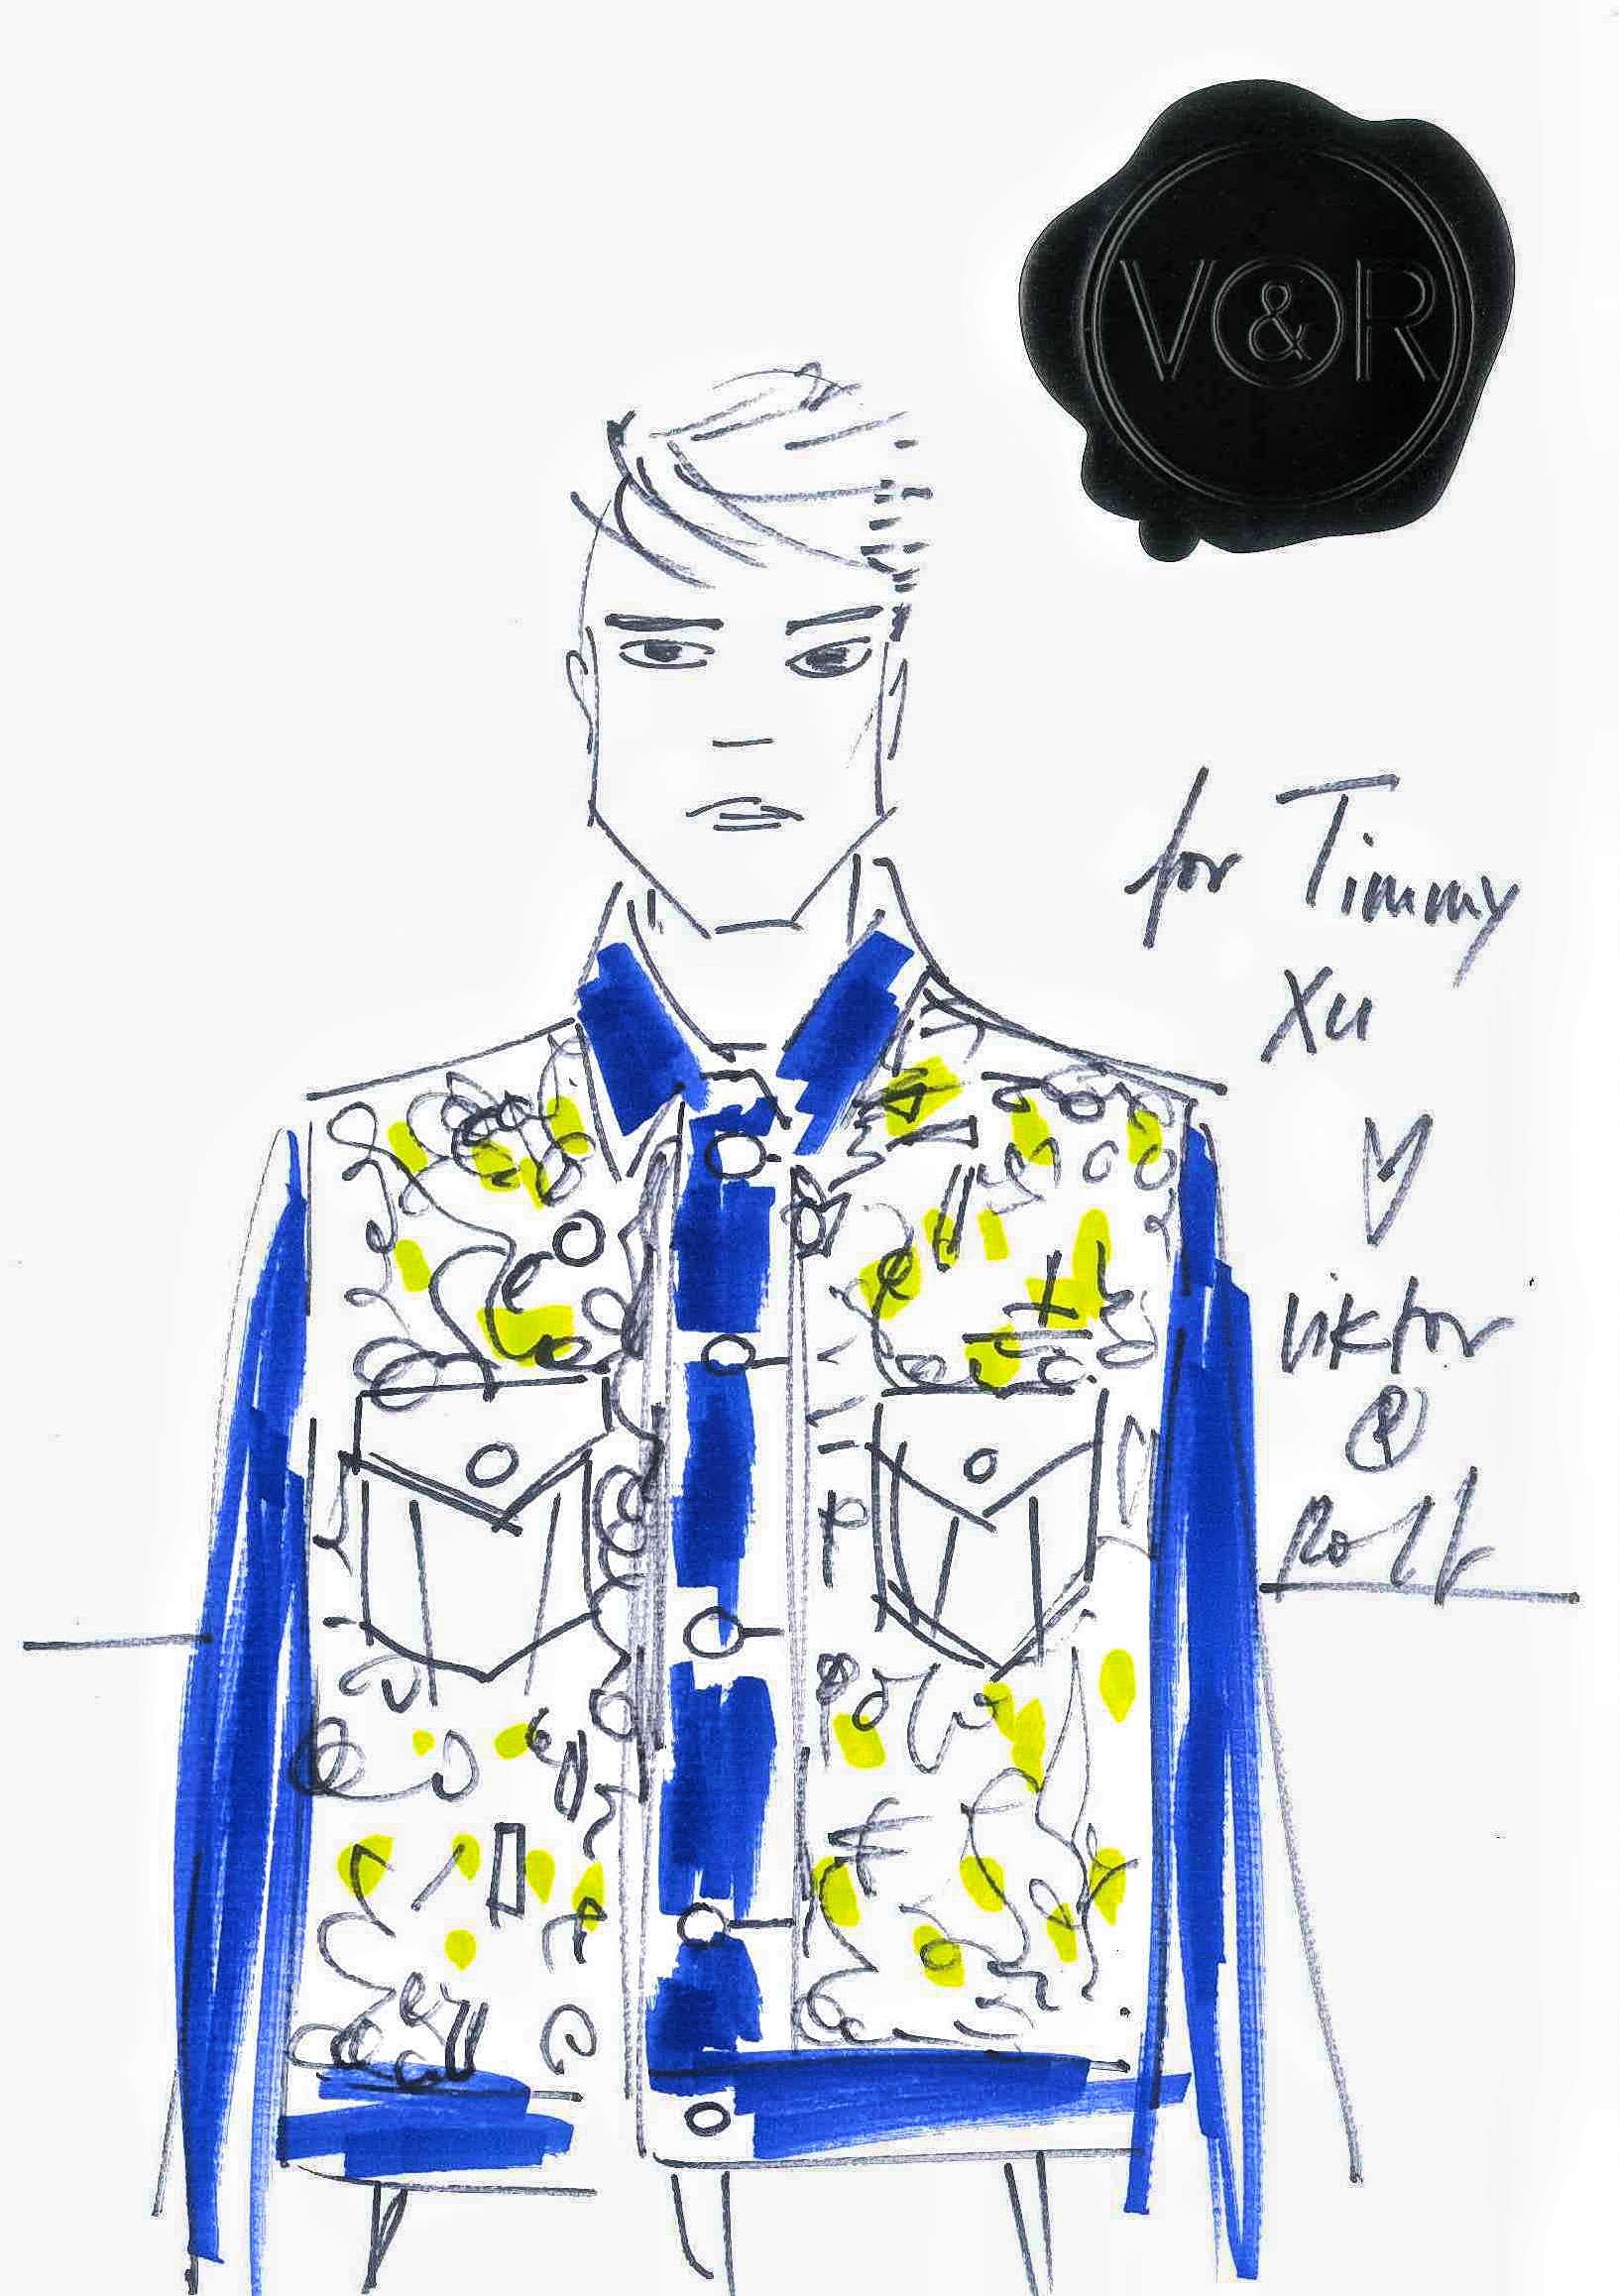 A sketch of Viktor & Rolf denim jacket for Xu Weizhou